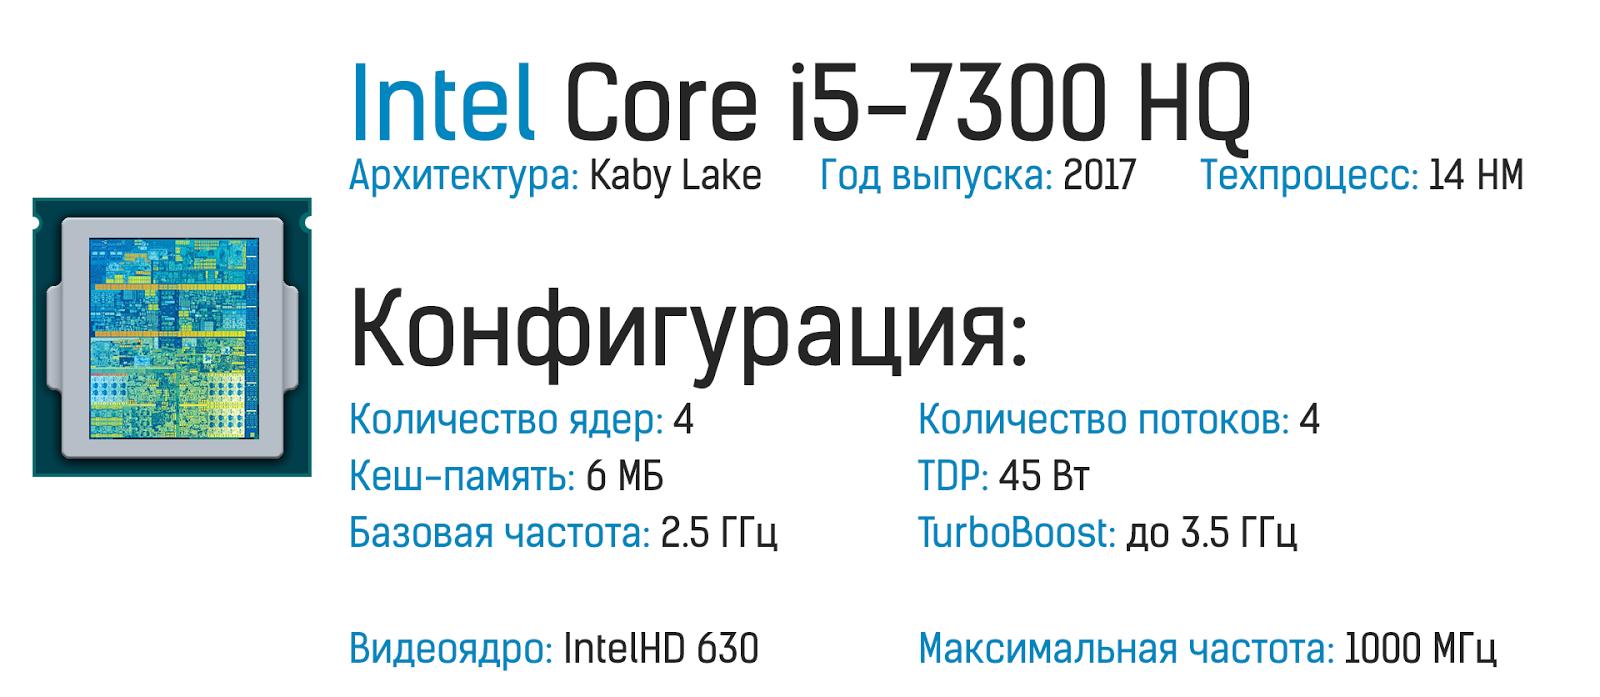 Балансируем на грани разумного с Lenovo Y520 - 16